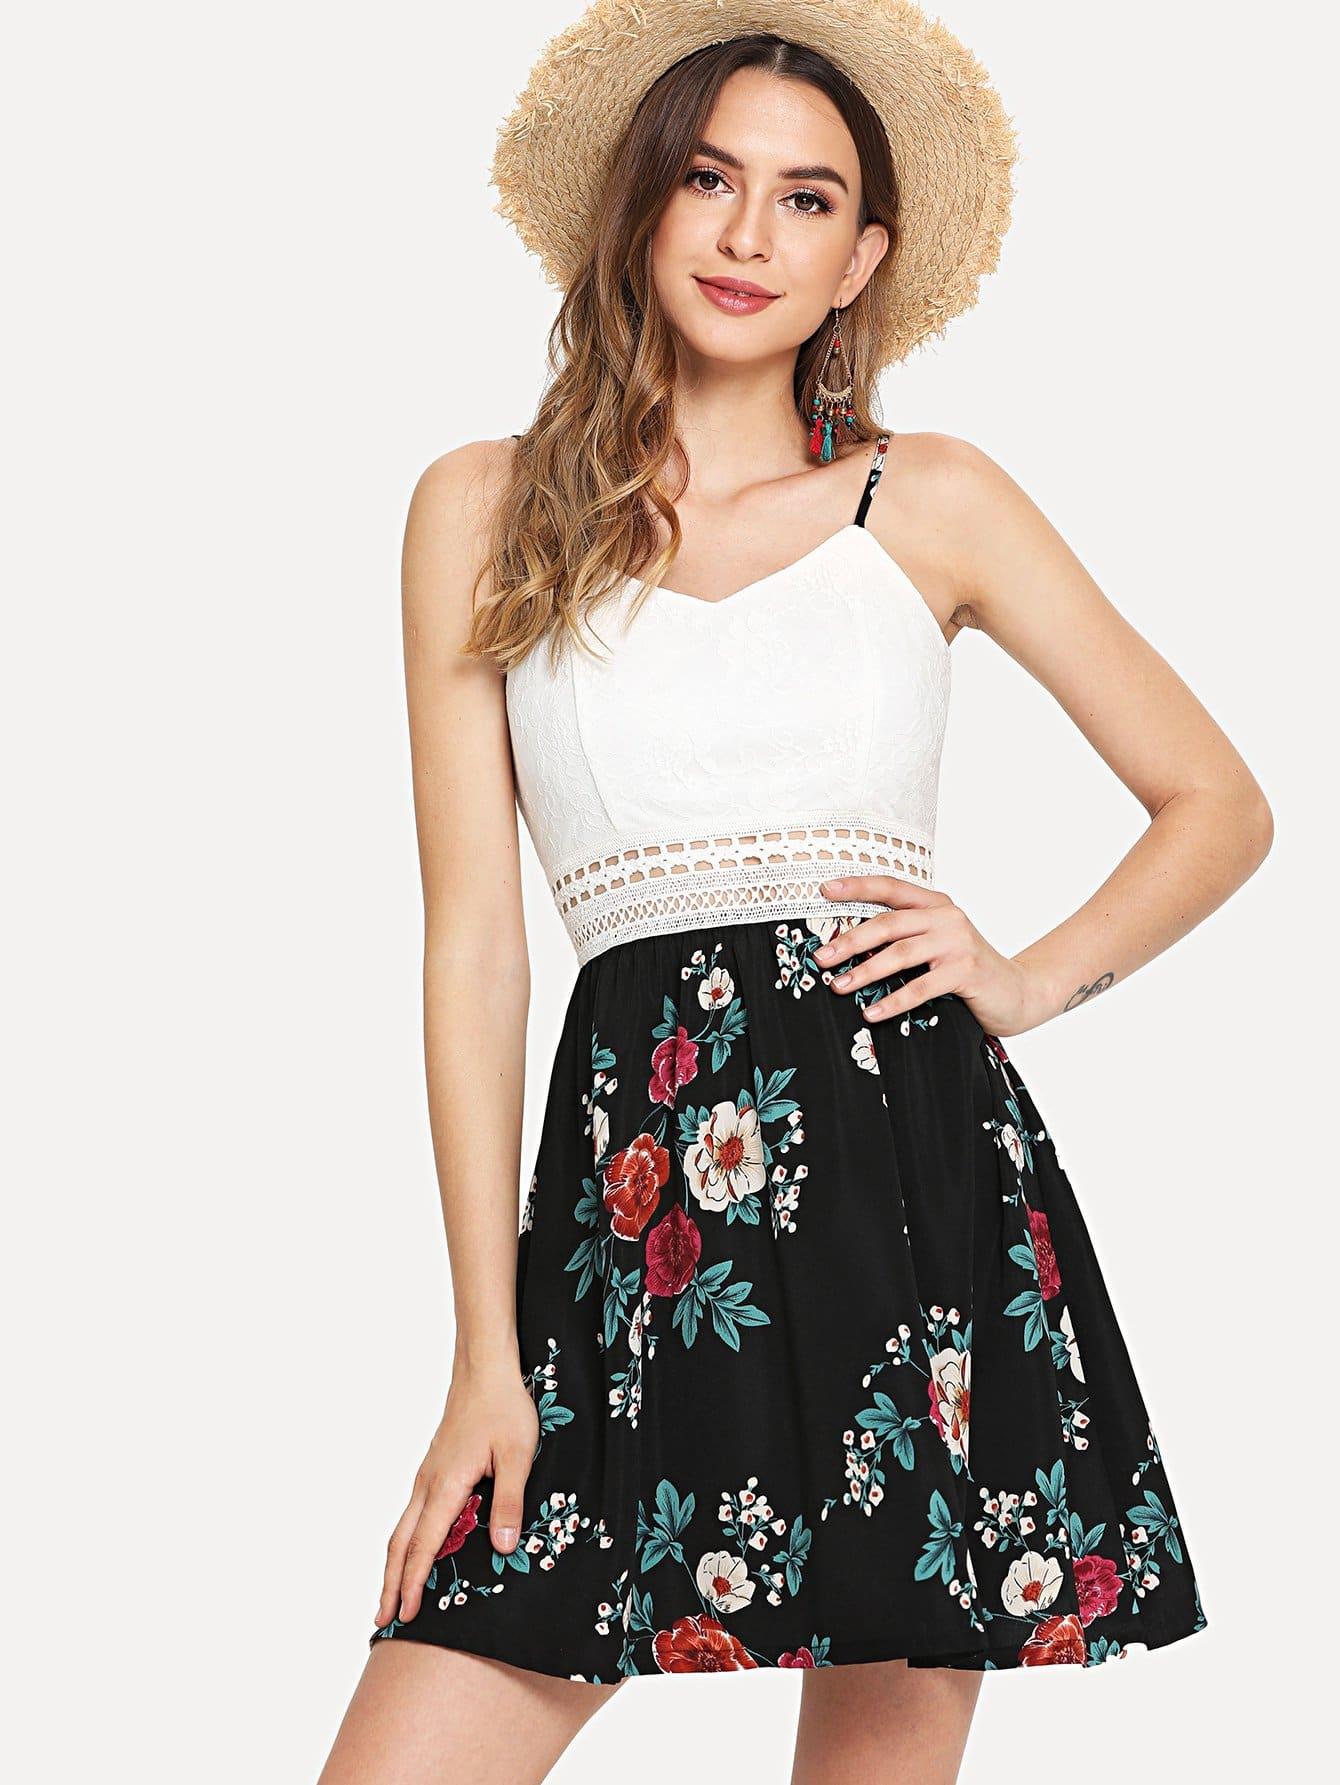 Cut Out Detail Lace Bodice Floral Cami Dress cami floral cut out tankini set